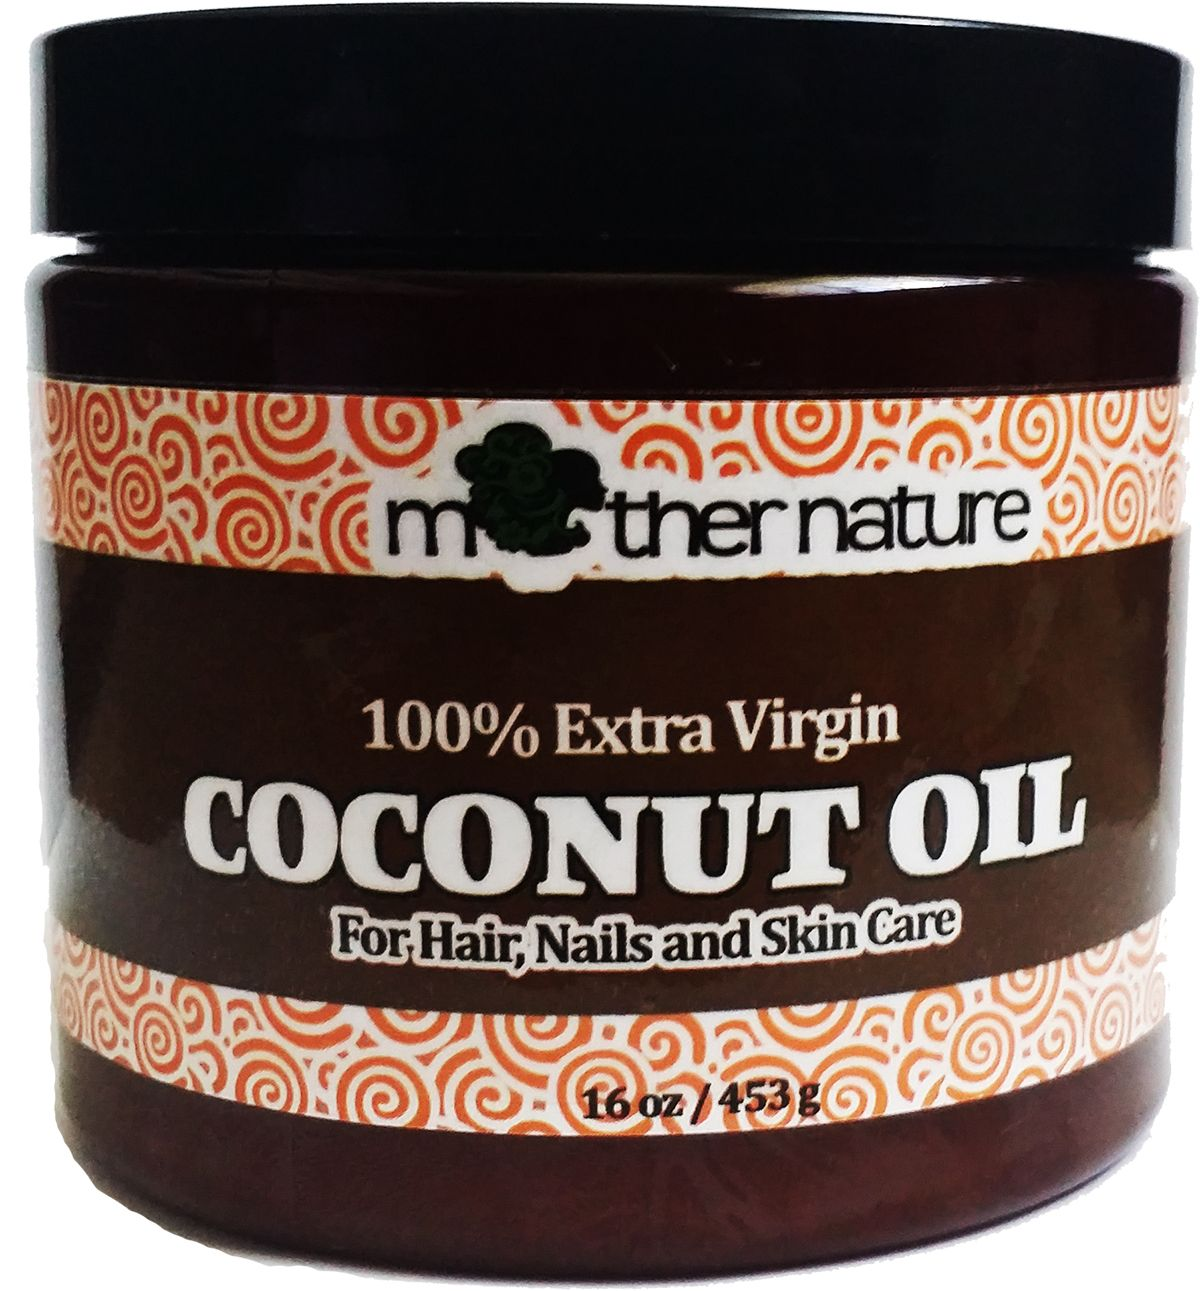 Coconut oil for hair coconut oil hair coconut oil hair